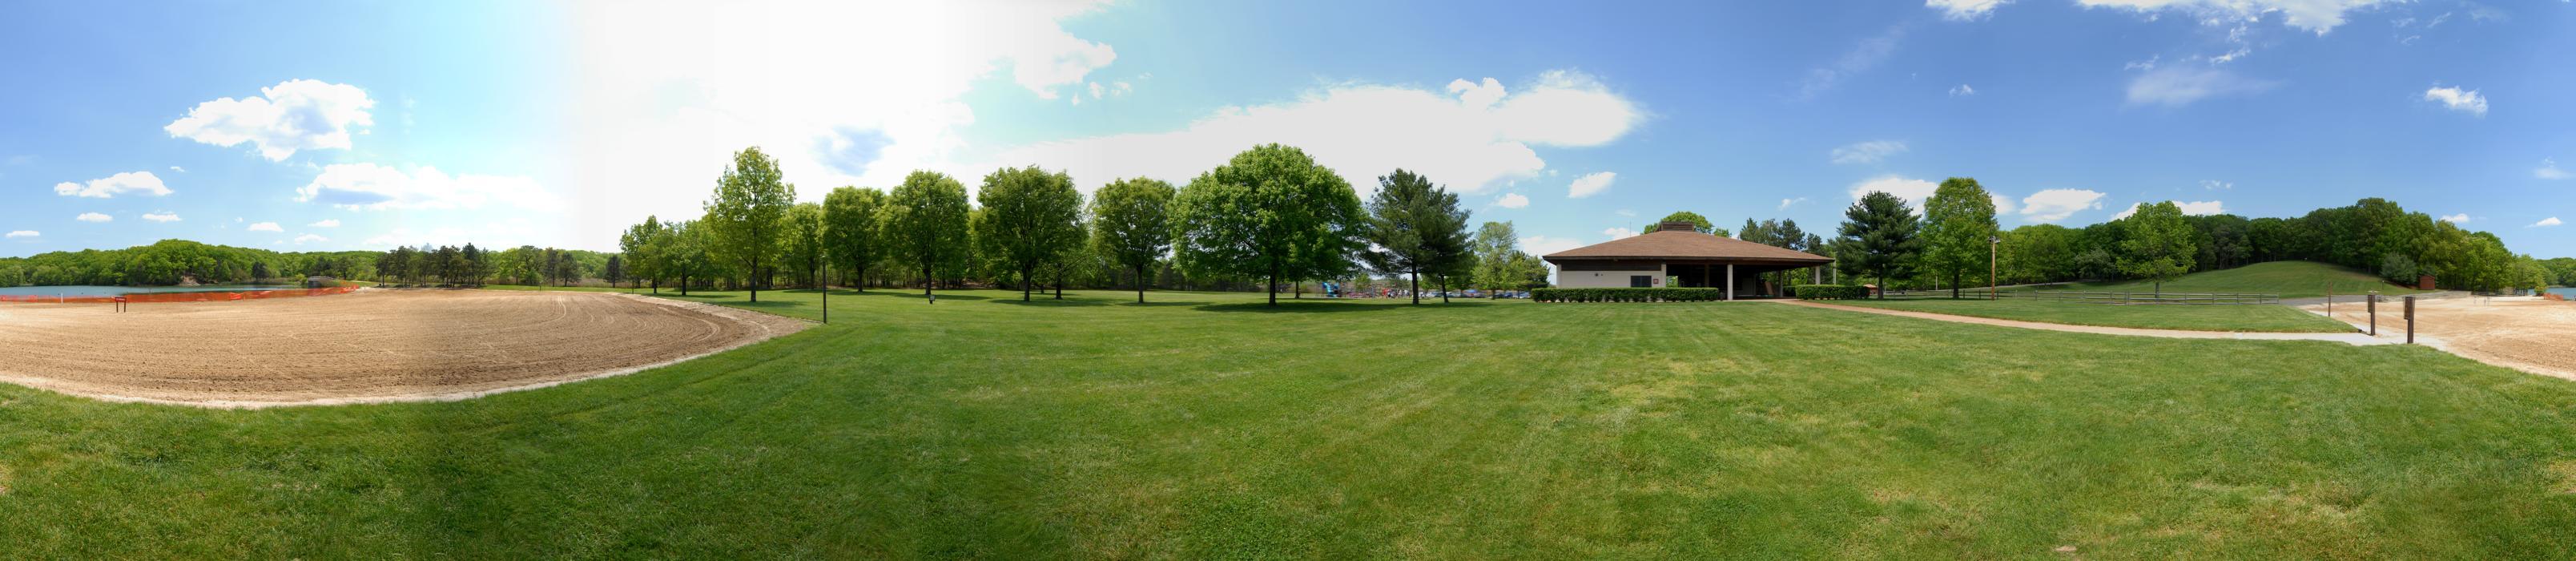 beach, blue sky, grass, panoramic, sand, trees